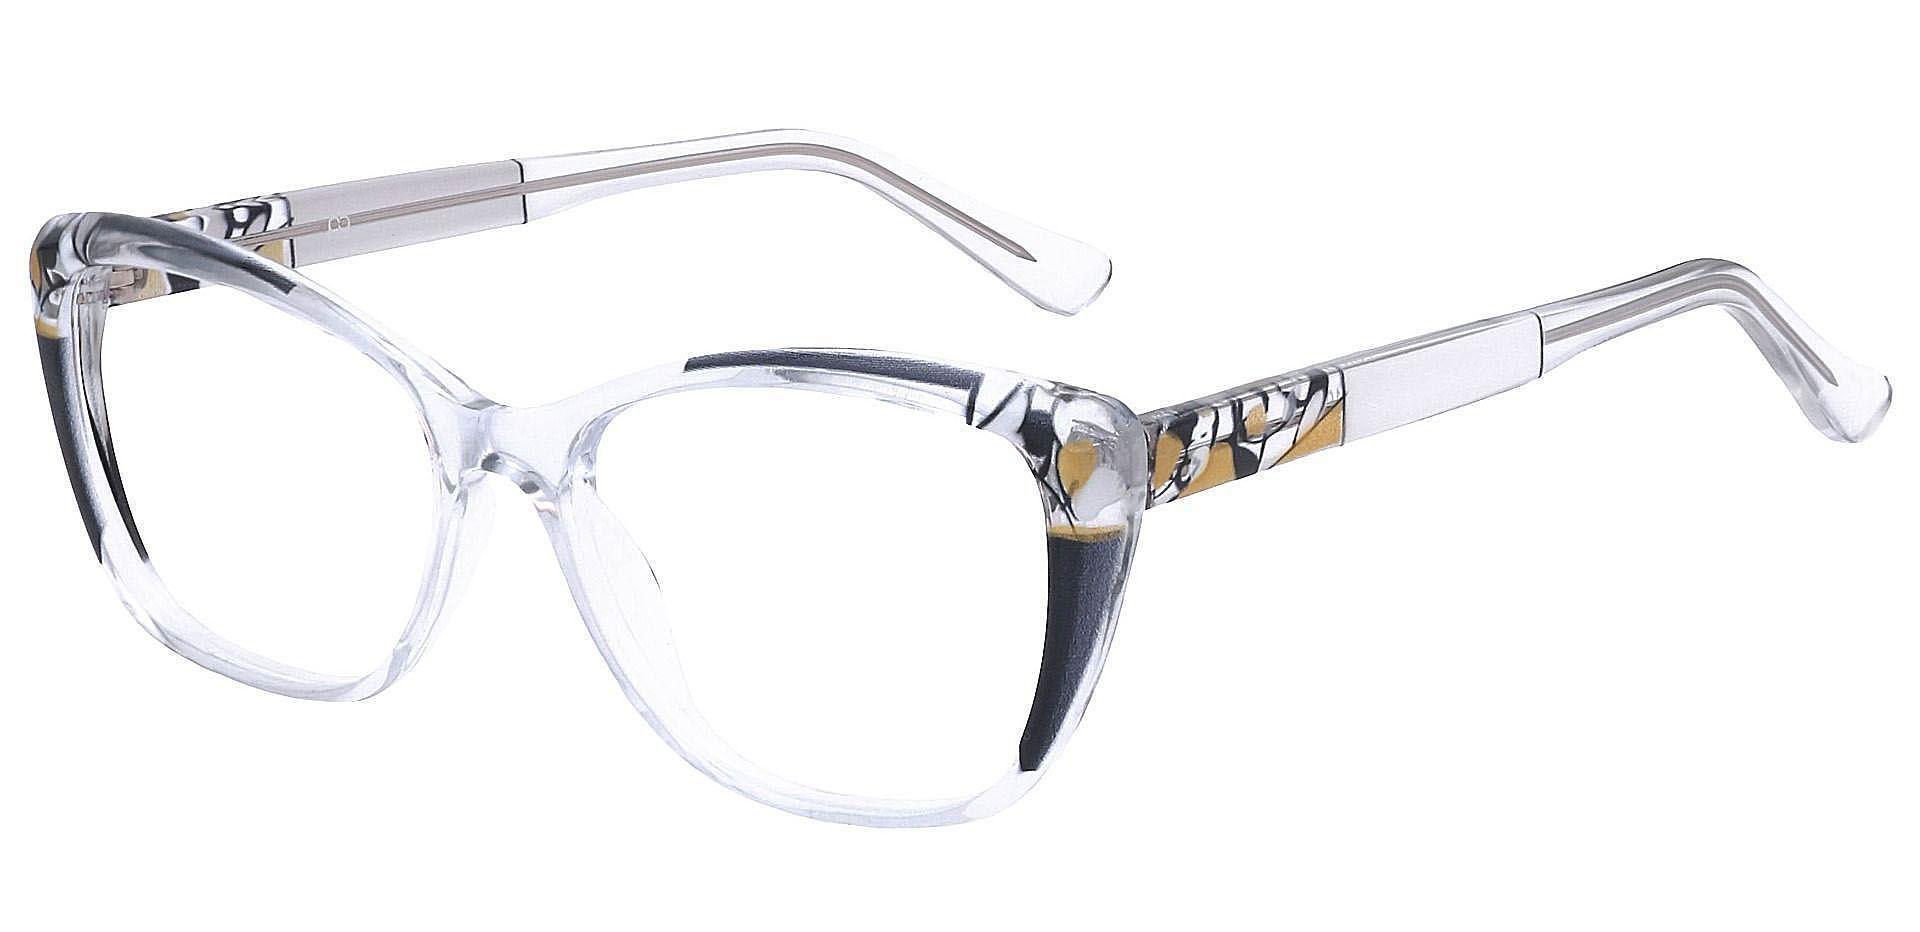 Marina Cat Eye Eyeglasses Frame - Black